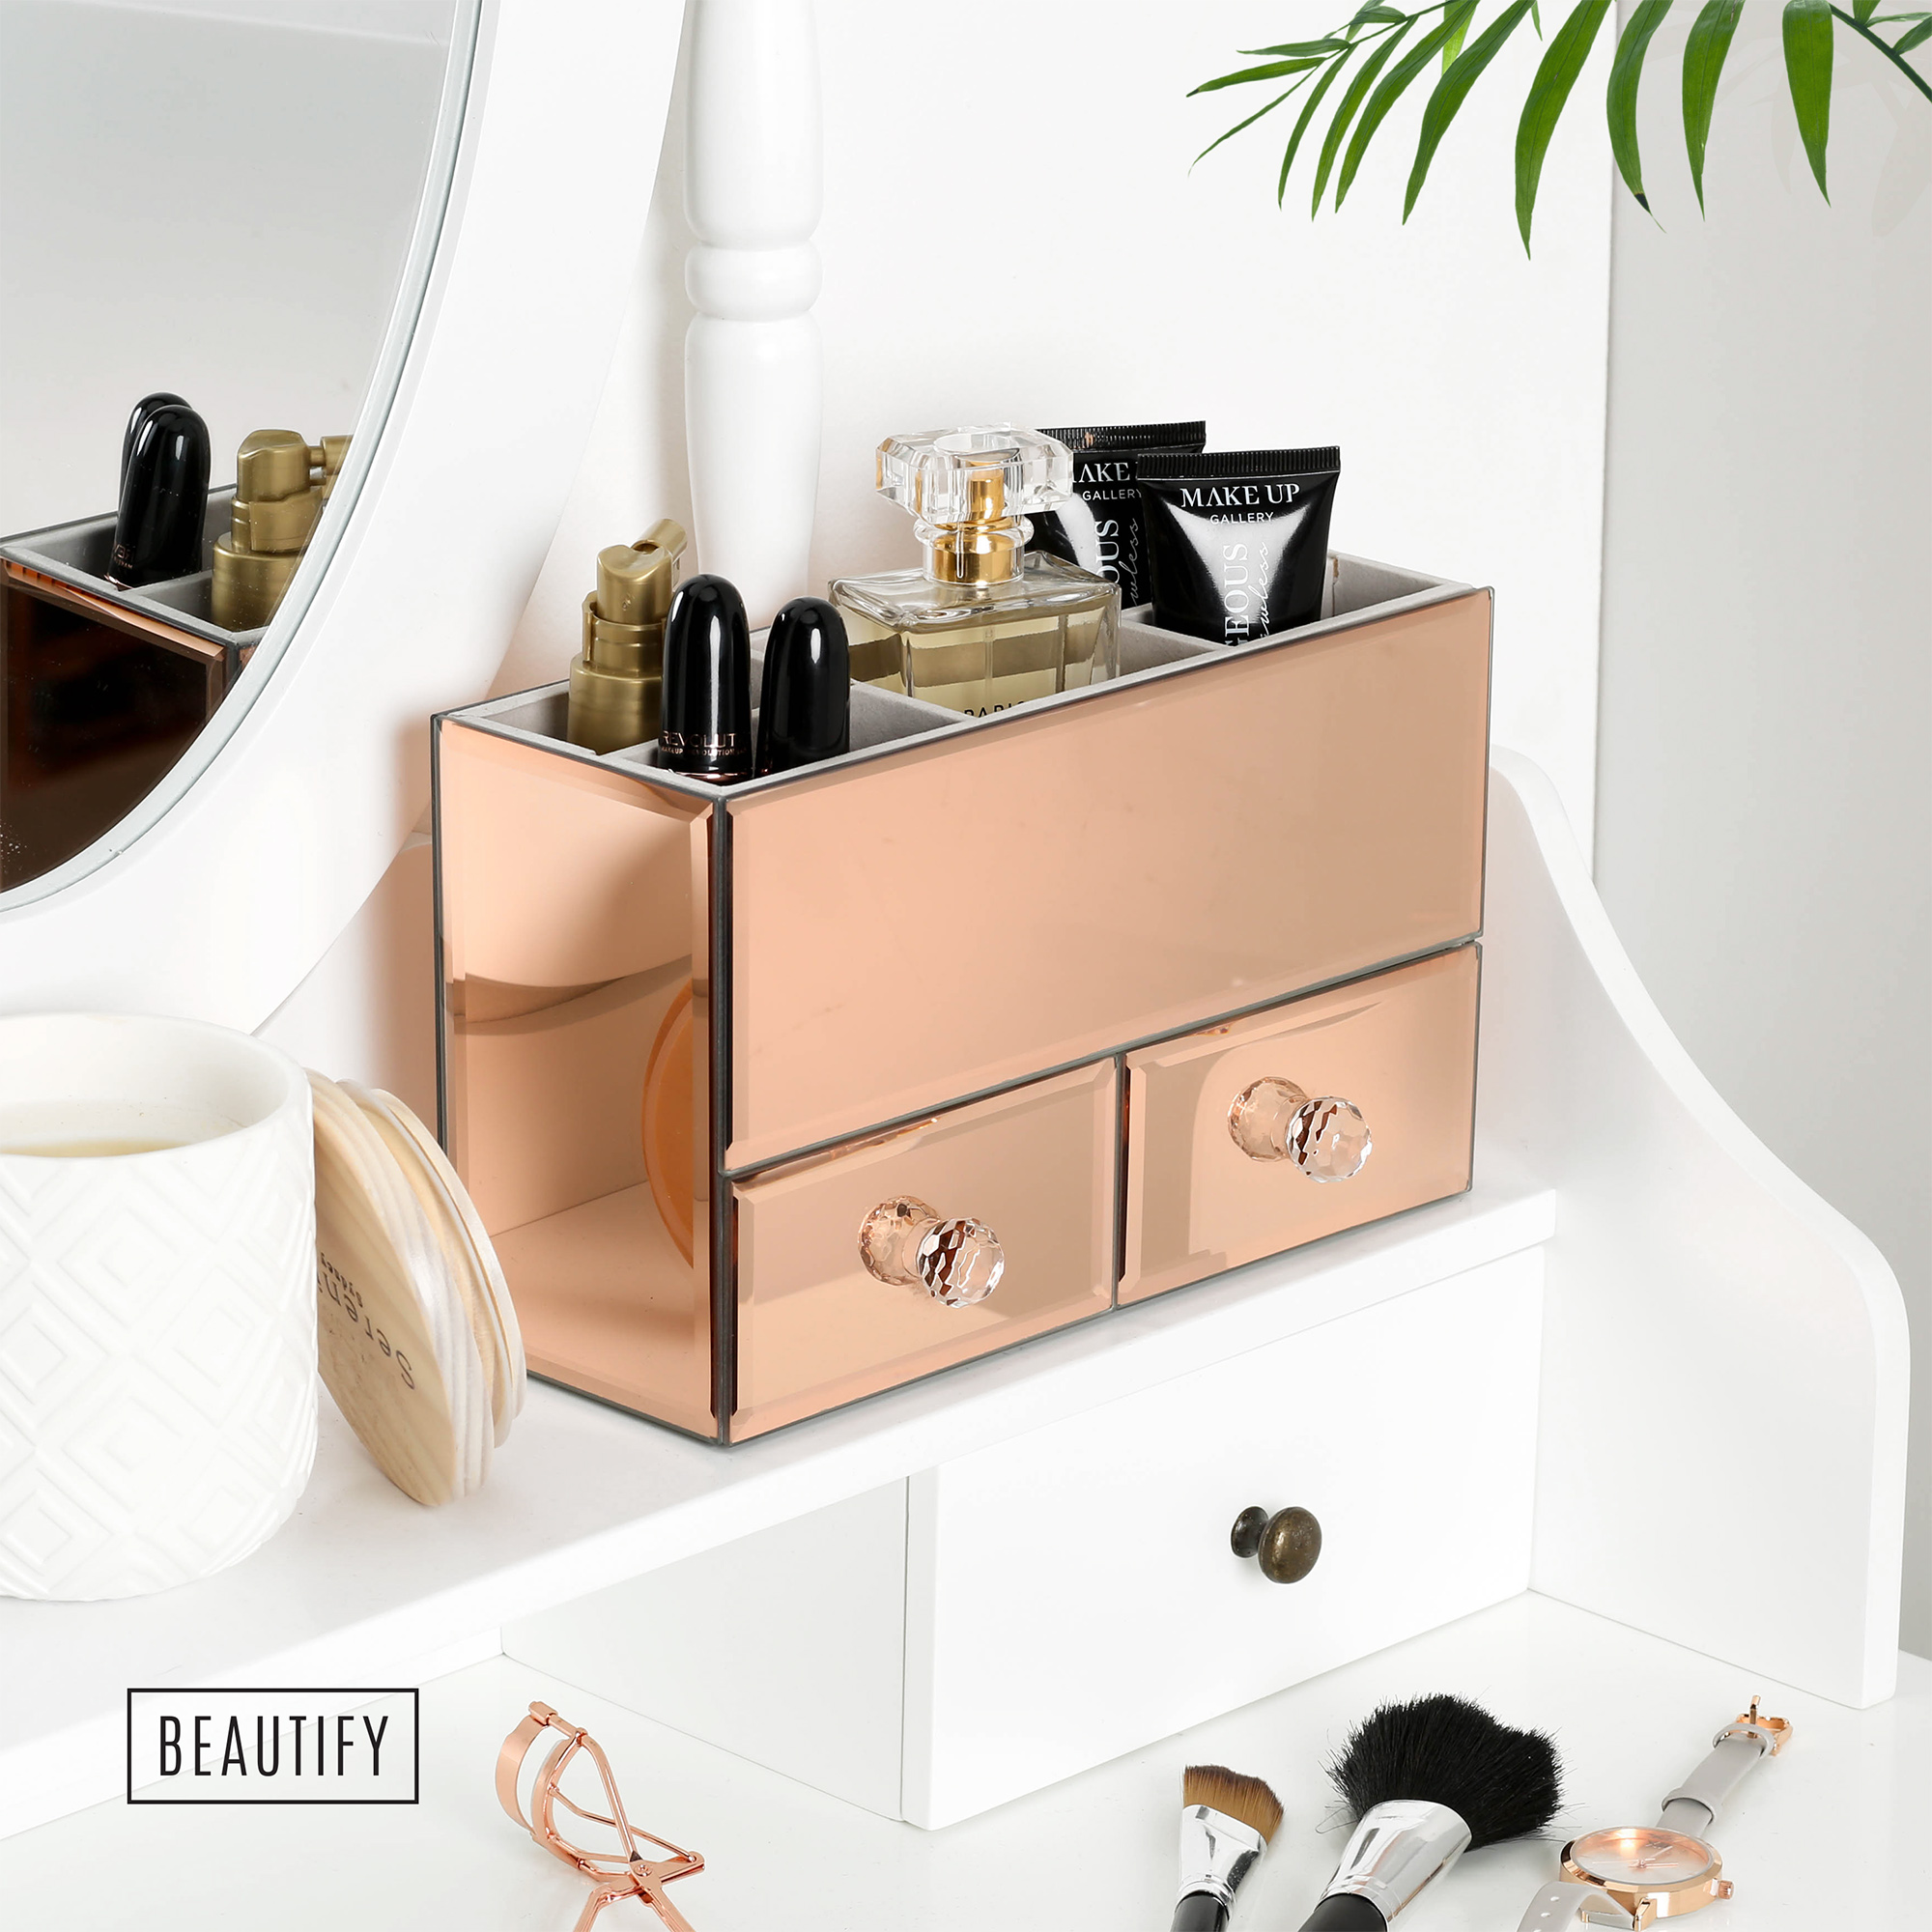 White Makeup Organizer Beautify Small Rose Gold Glass Jewelry Box Cosmetic Makeup